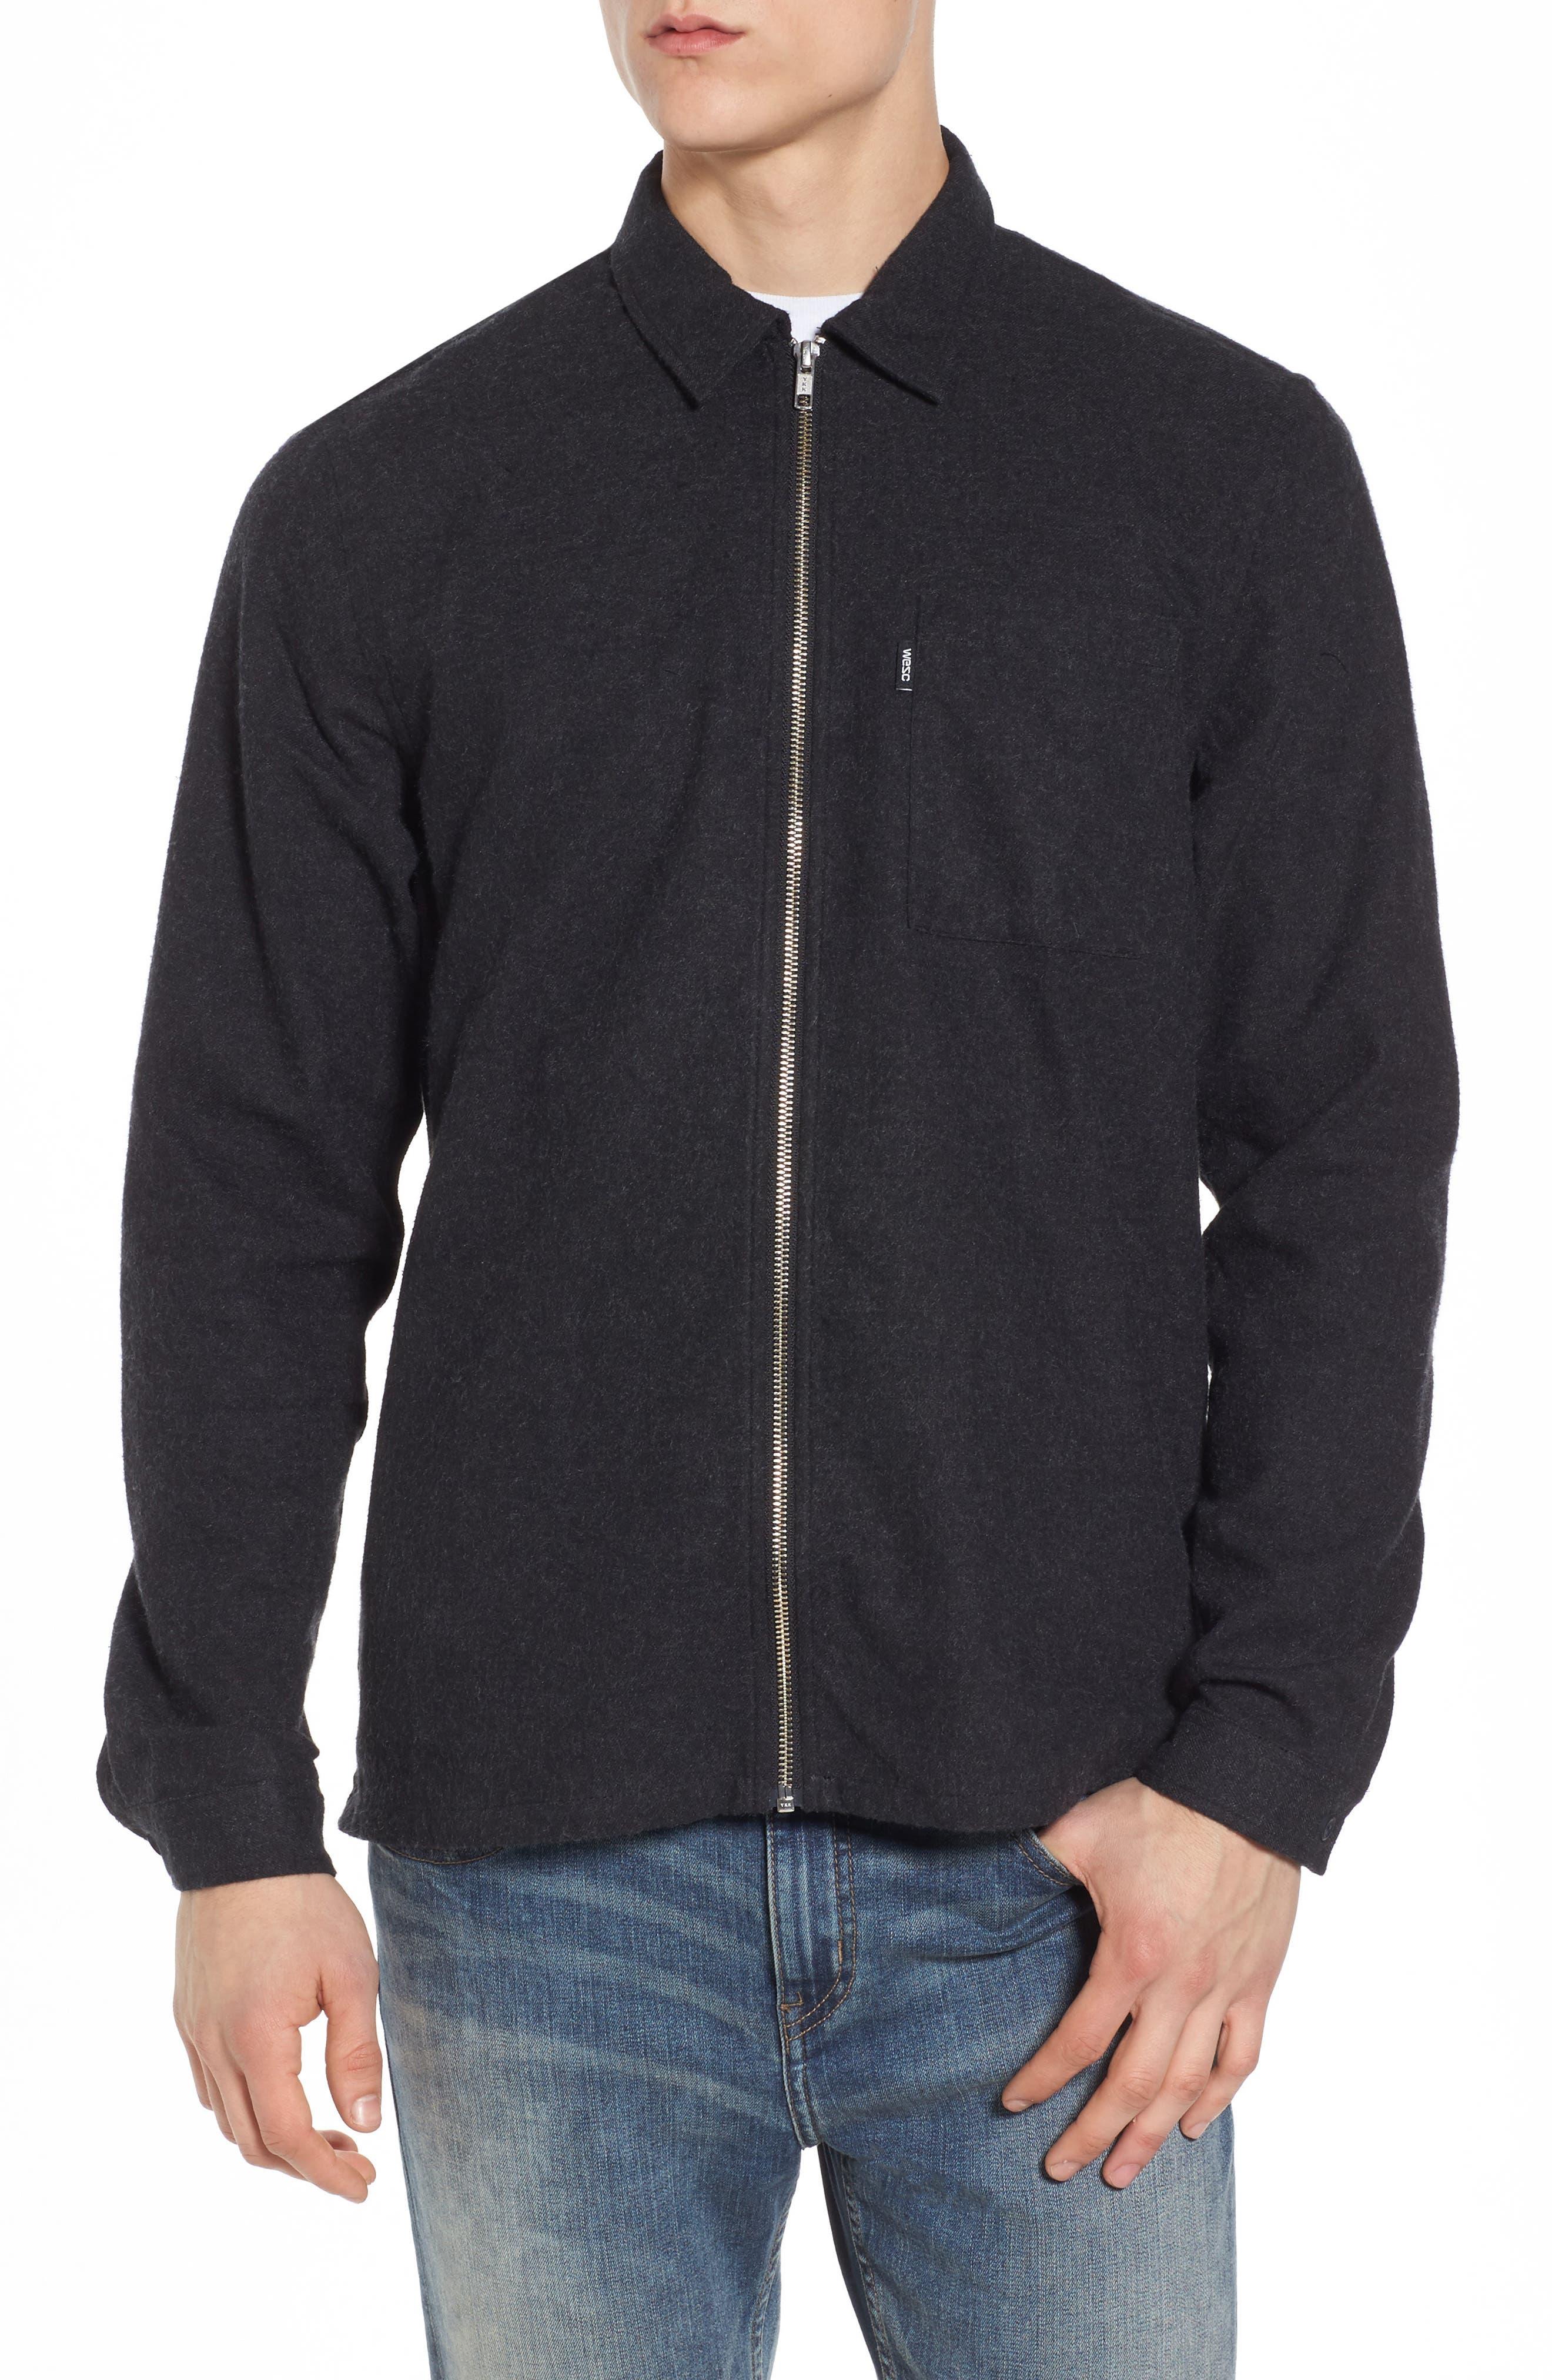 Nicks Flannel Zip Overshirt,                         Main,                         color, Black